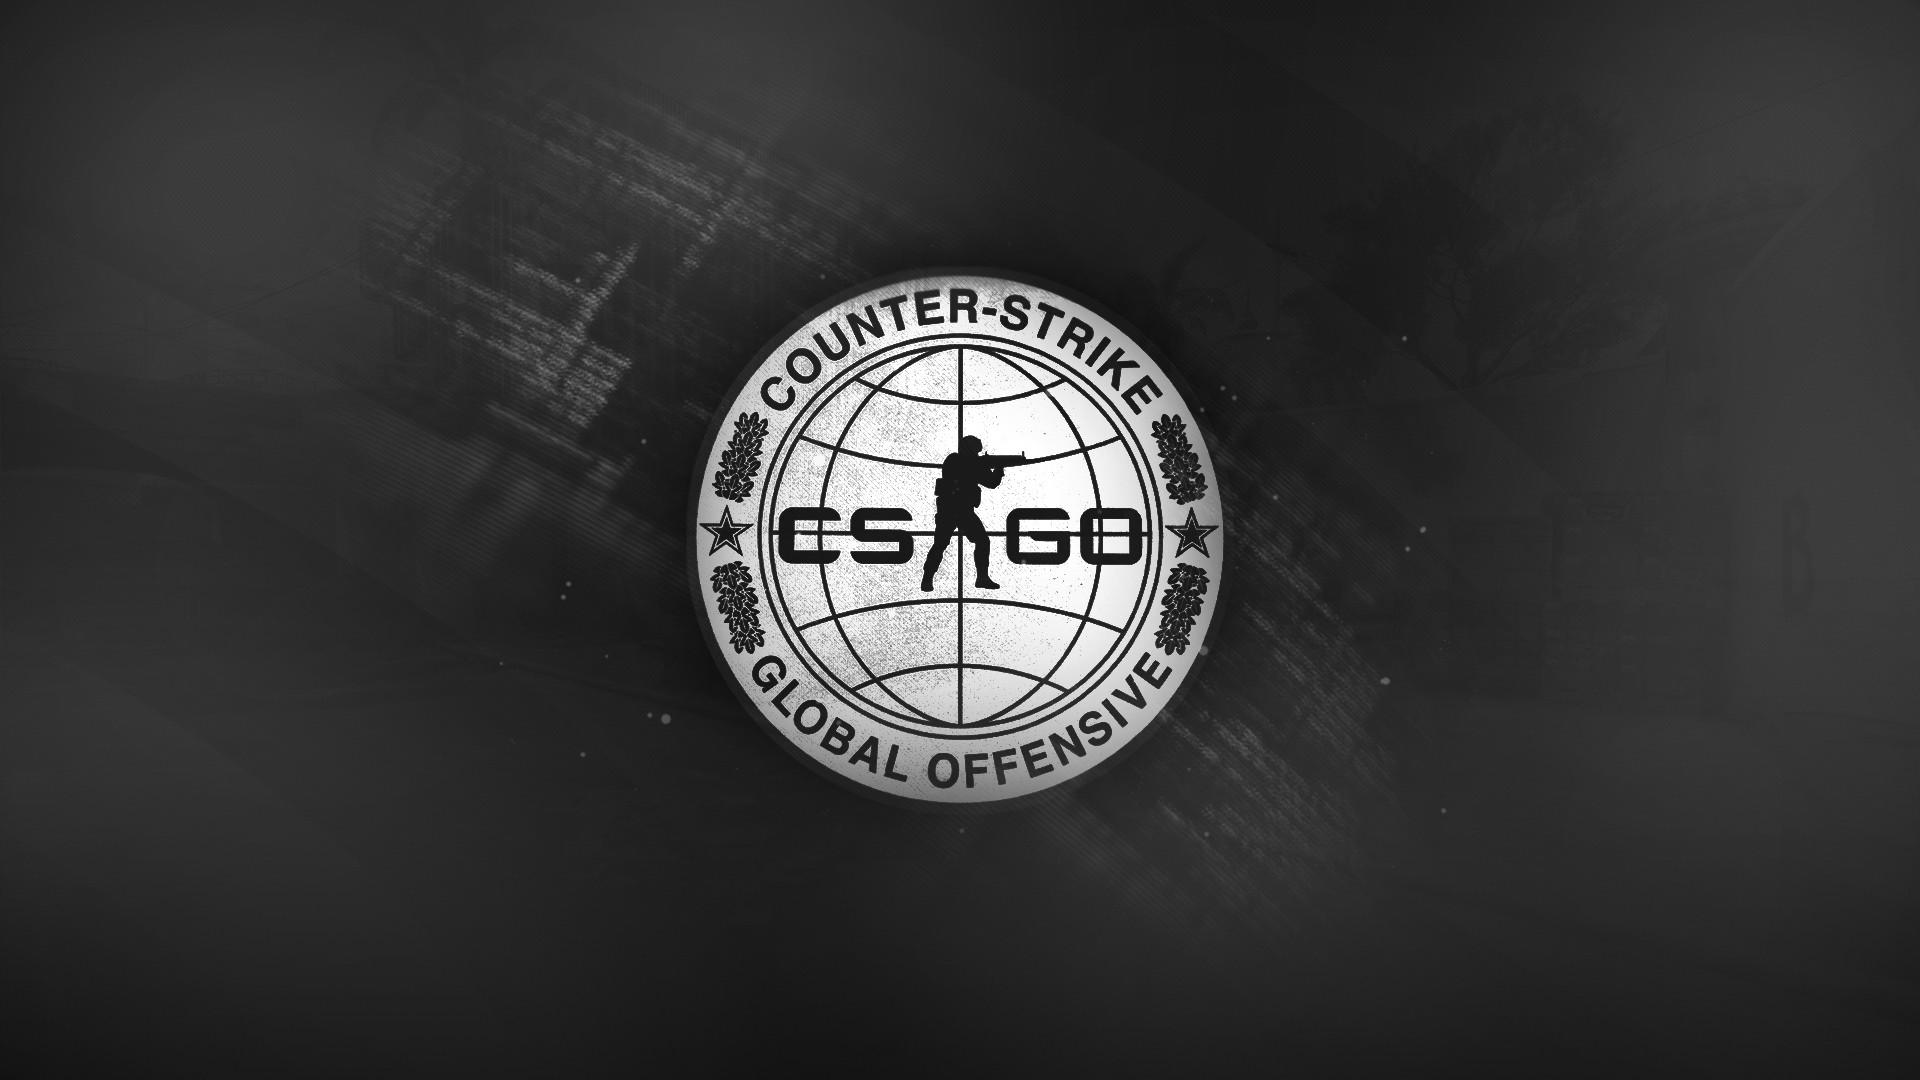 CS:GO Wallpaper Logo. #games #globaloffensive #CSGO #counterstrike #hltv